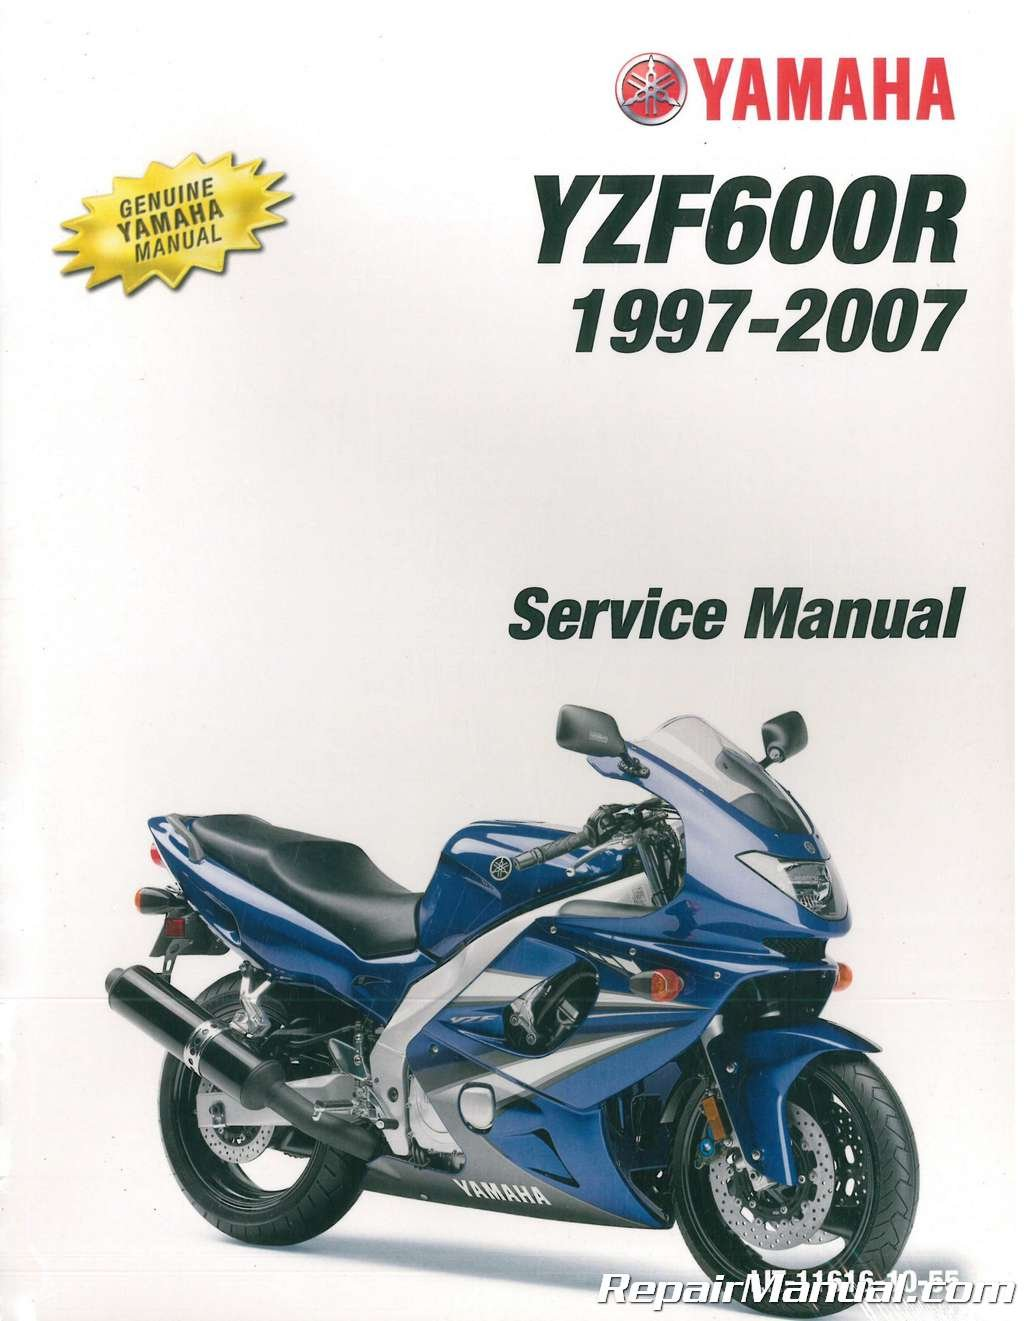 LIT-11616-10-55 1997-2007 Yamaha YZF600 Service Manual: Manufacturer:  Amazon.com: Books